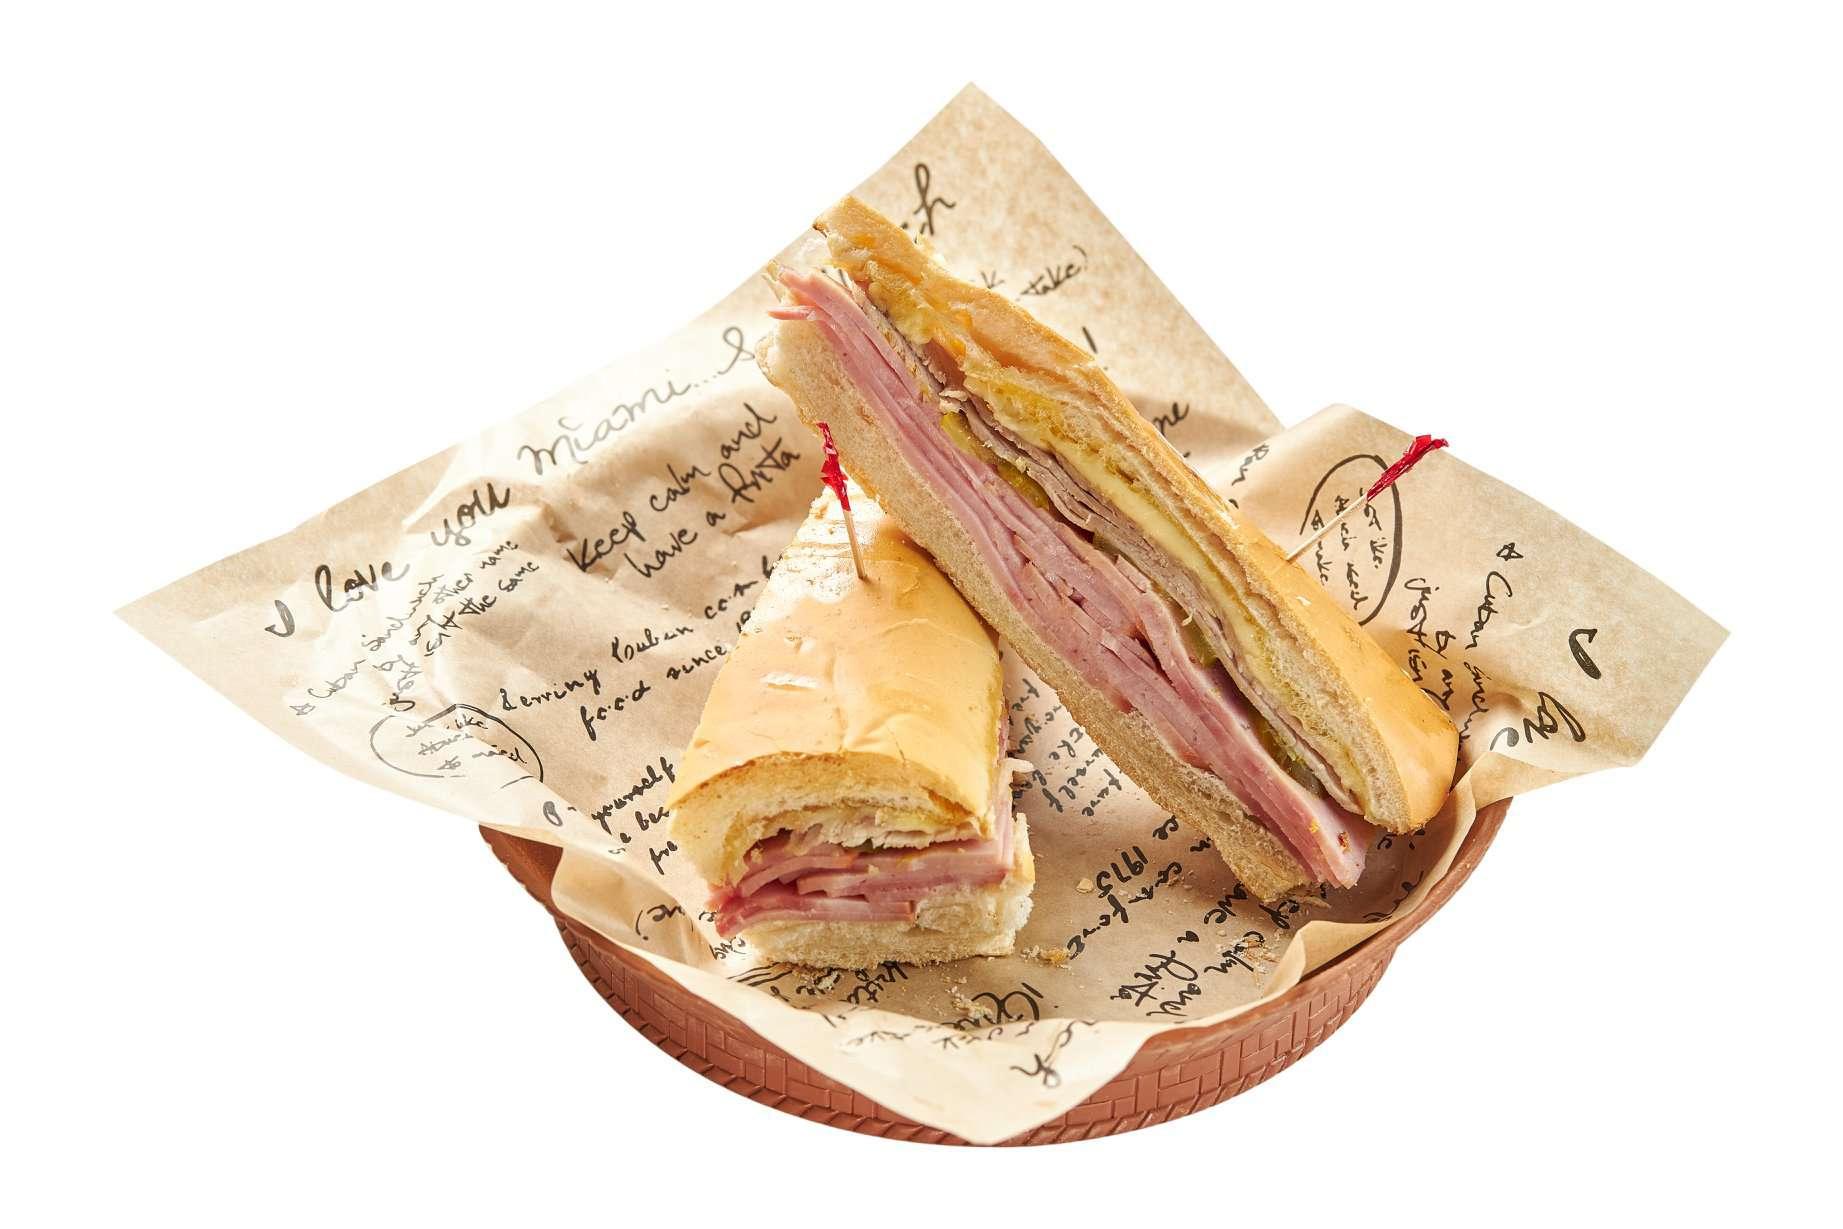 A cuban sandwich from Sergio's